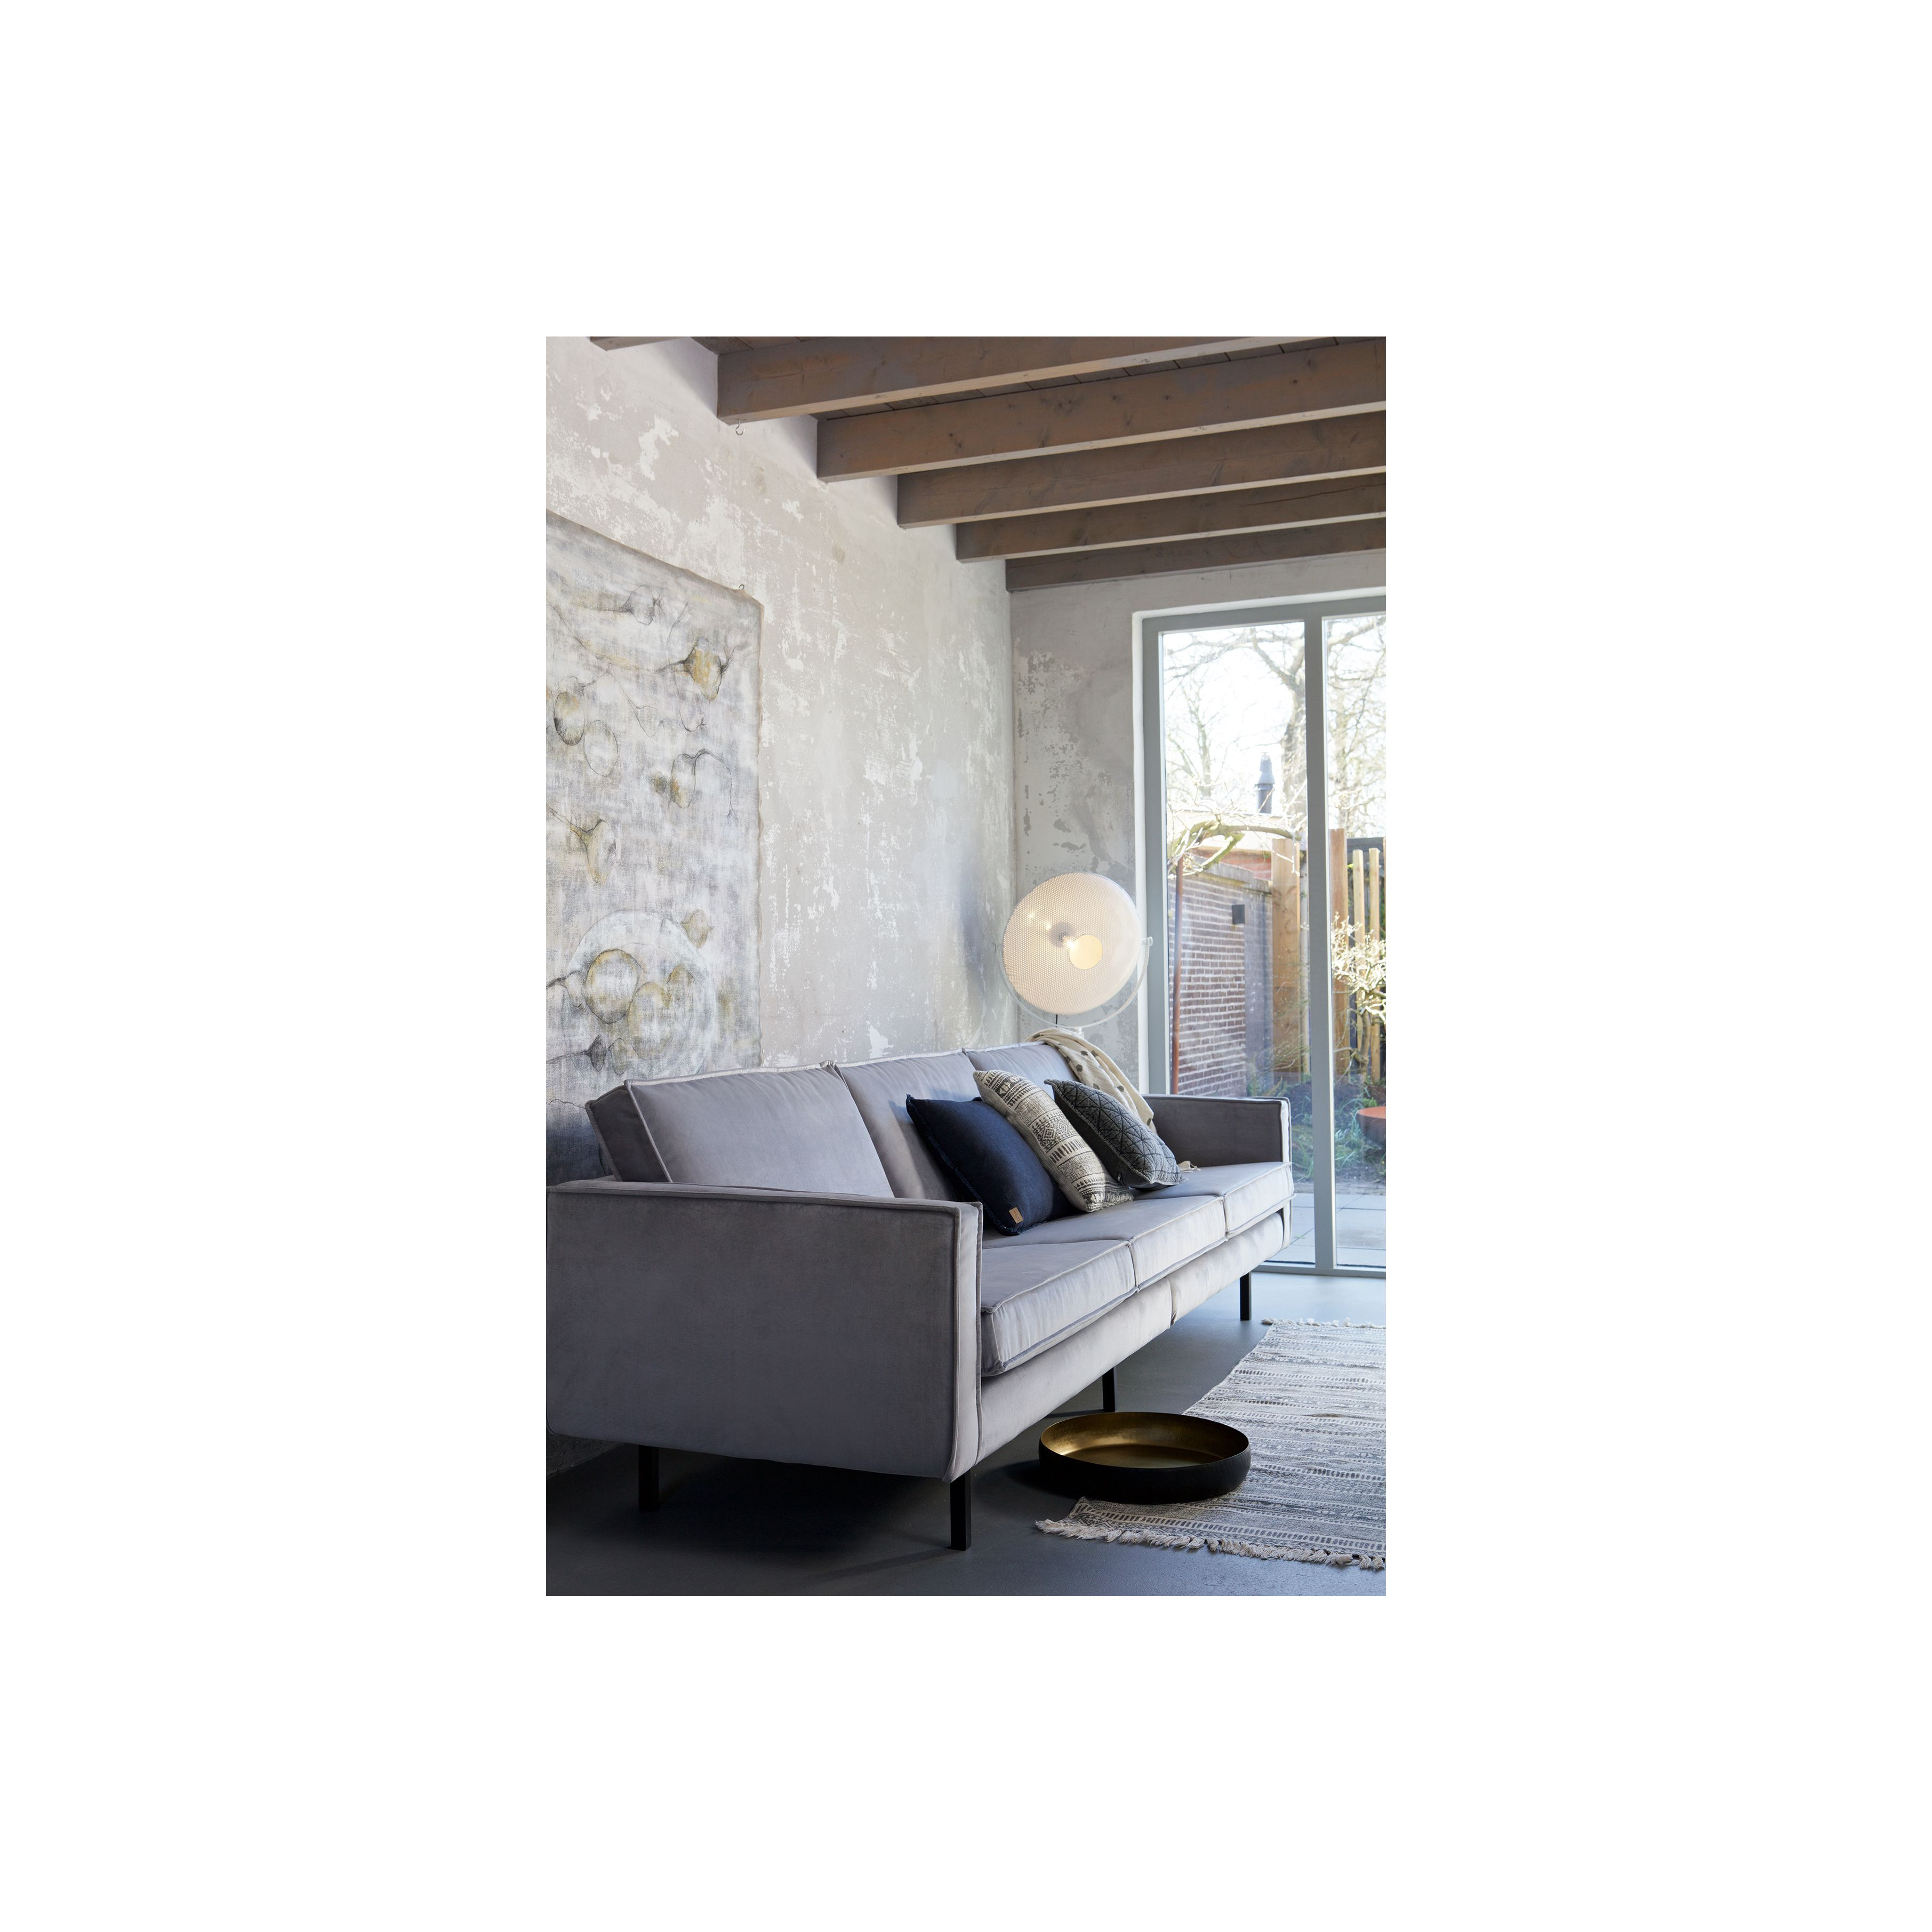 3-Sitzer-Sofa | Samt hellgrau